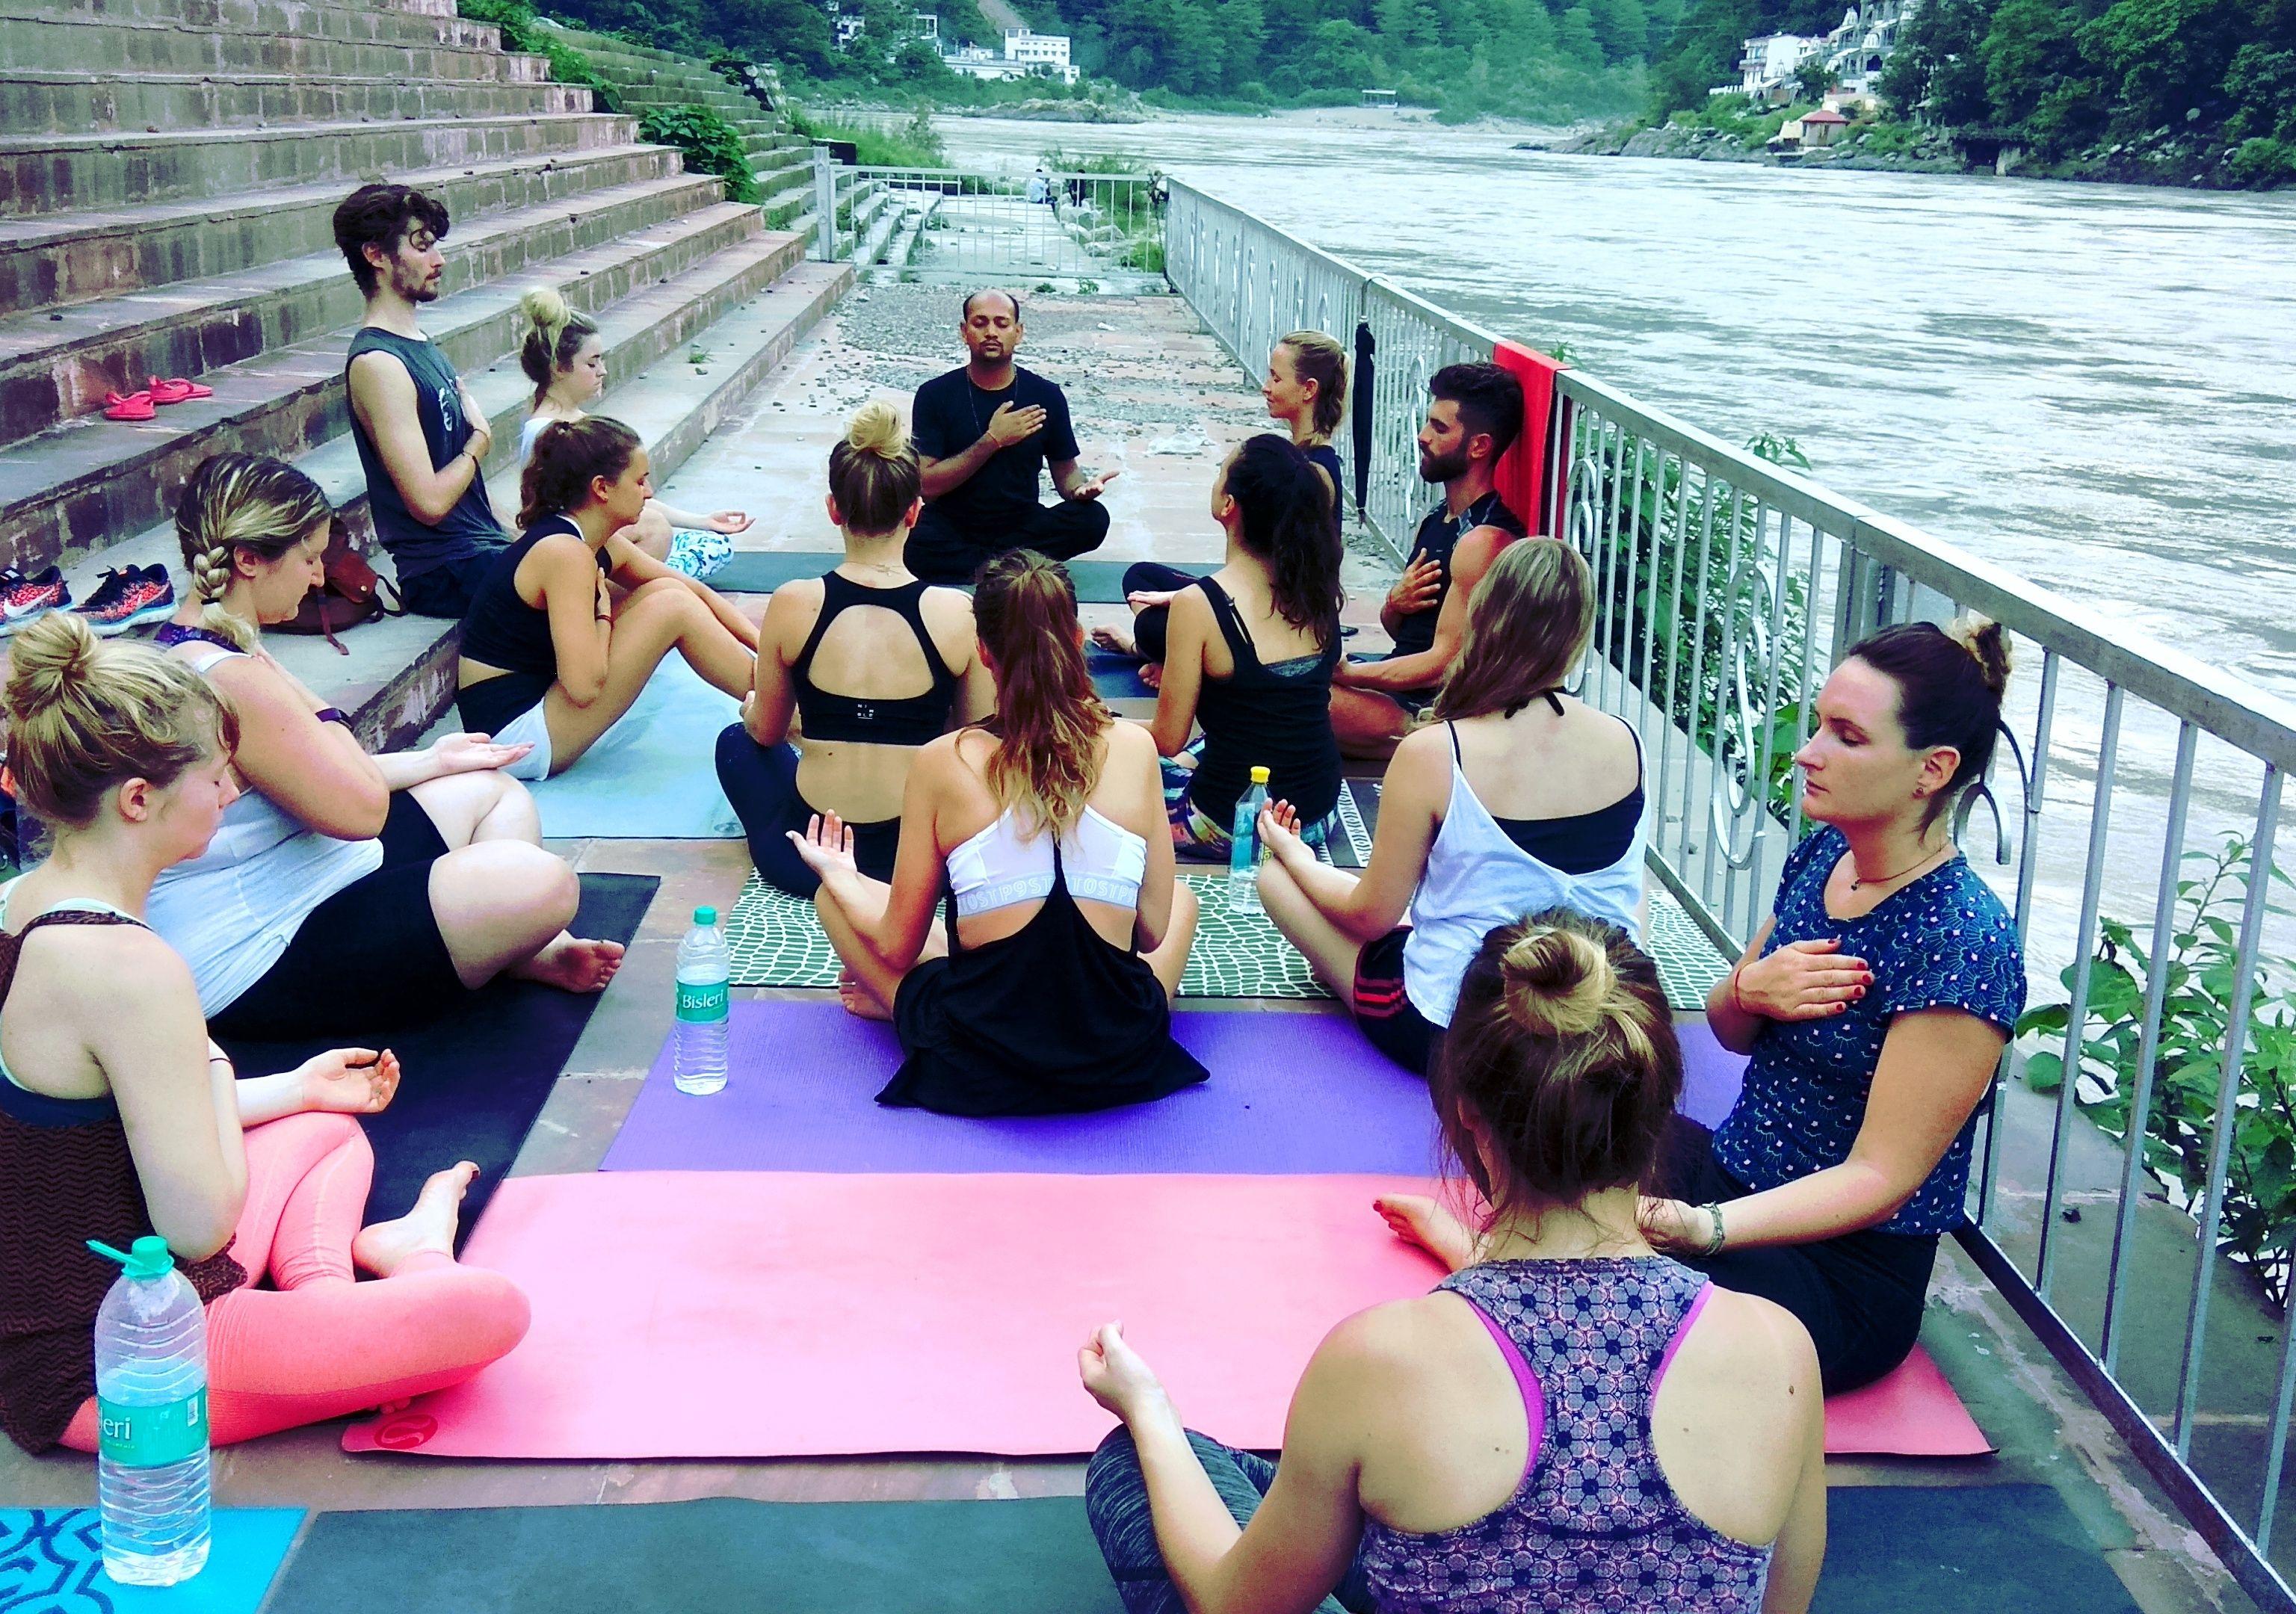 Inroducing 200 Hour Yoga Meditation Teacher Training Certification